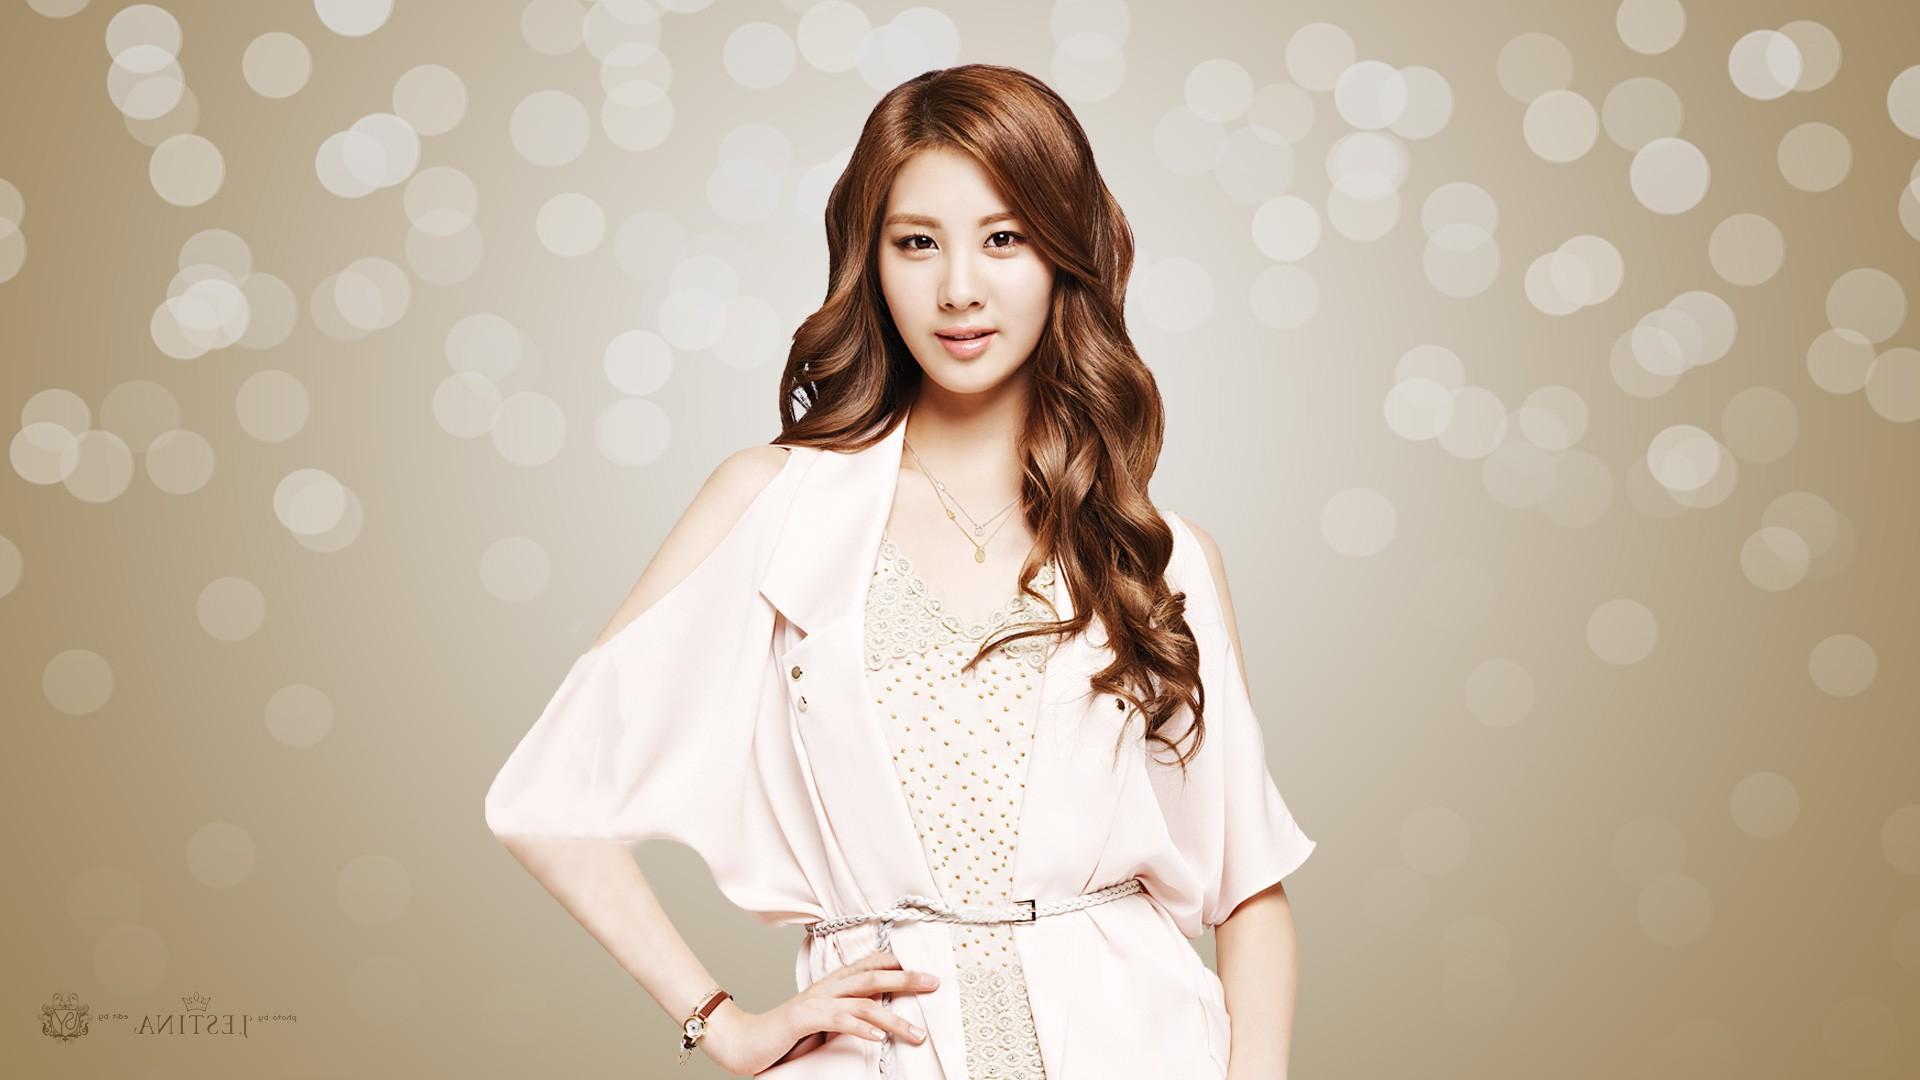 Wallpaper : white, model, long hair, Asian, singer, fashion